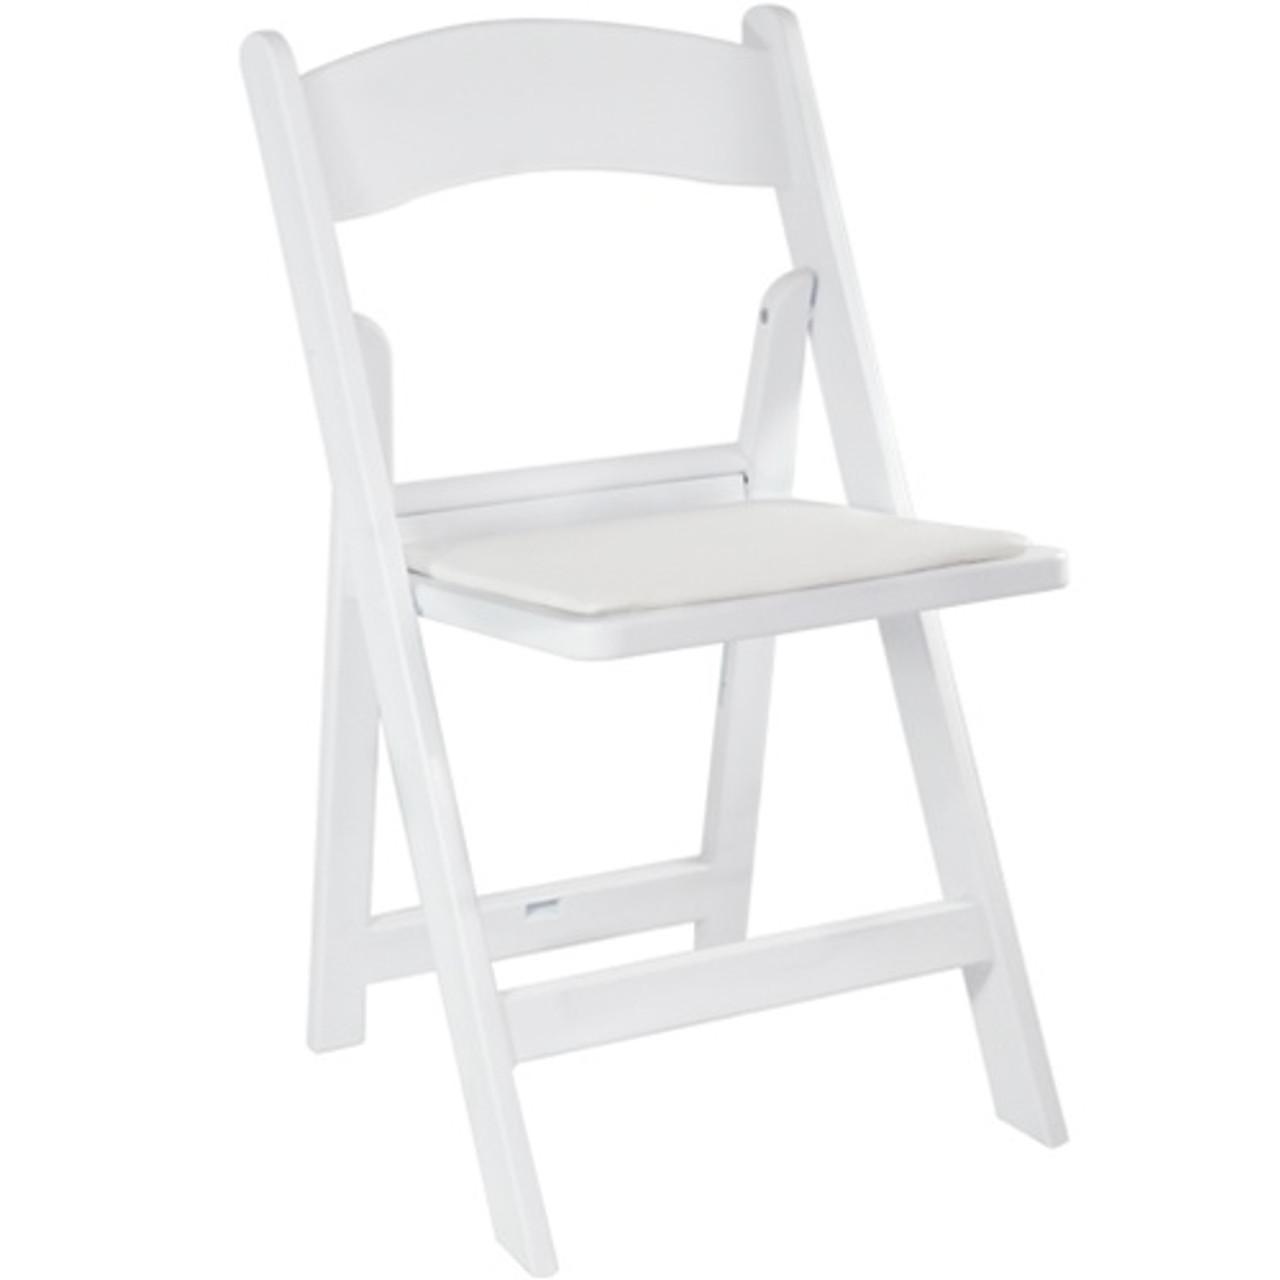 Brilliant Advantage White Resin Folding Chairs Le L 1 White Gg Theyellowbook Wood Chair Design Ideas Theyellowbookinfo